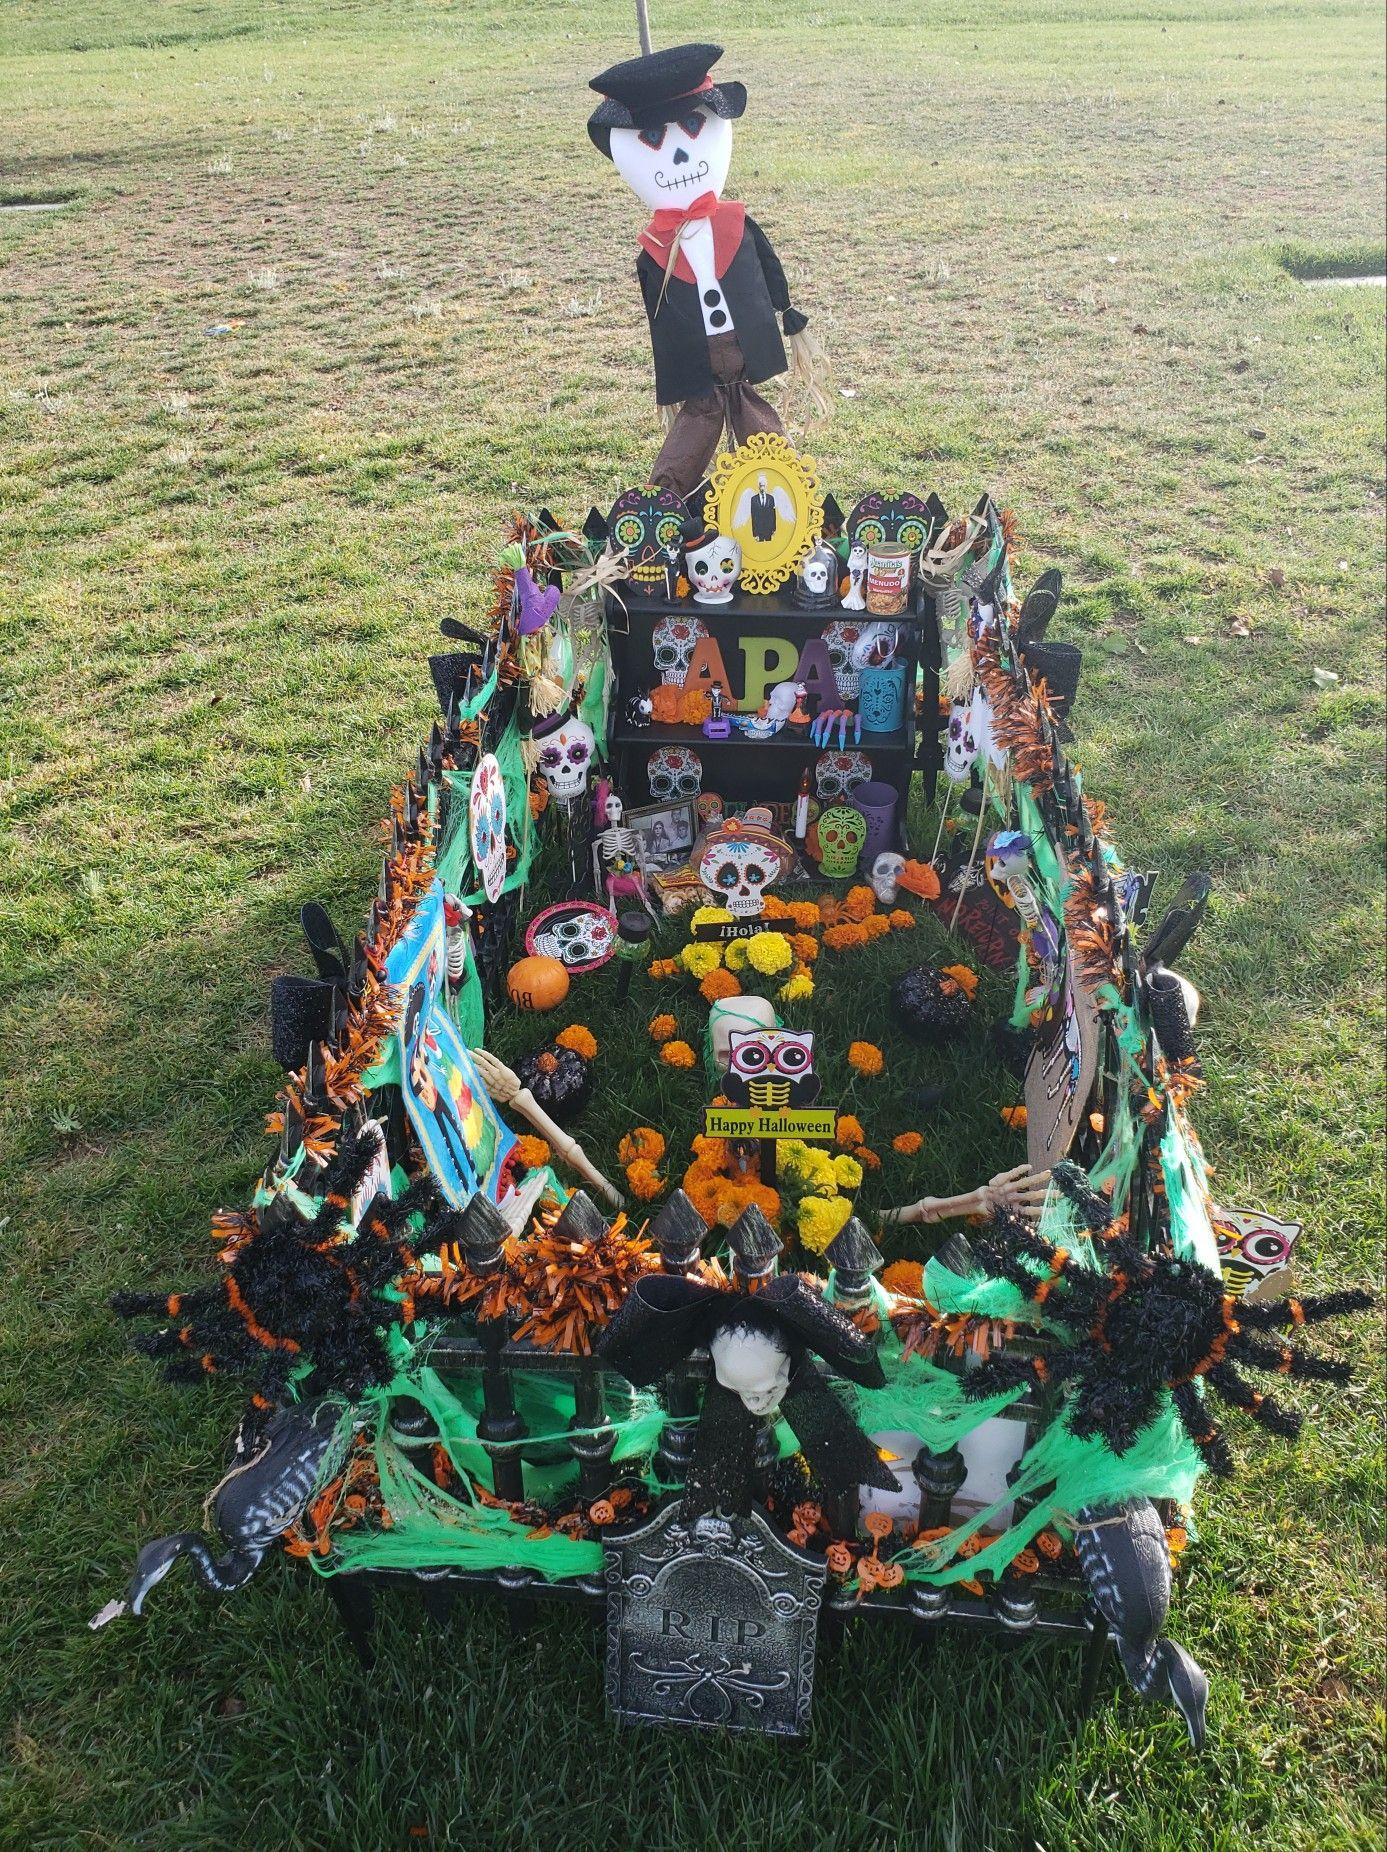 Dia De Los Muertos 2018 Grave Decorations Dad S Decorations At The